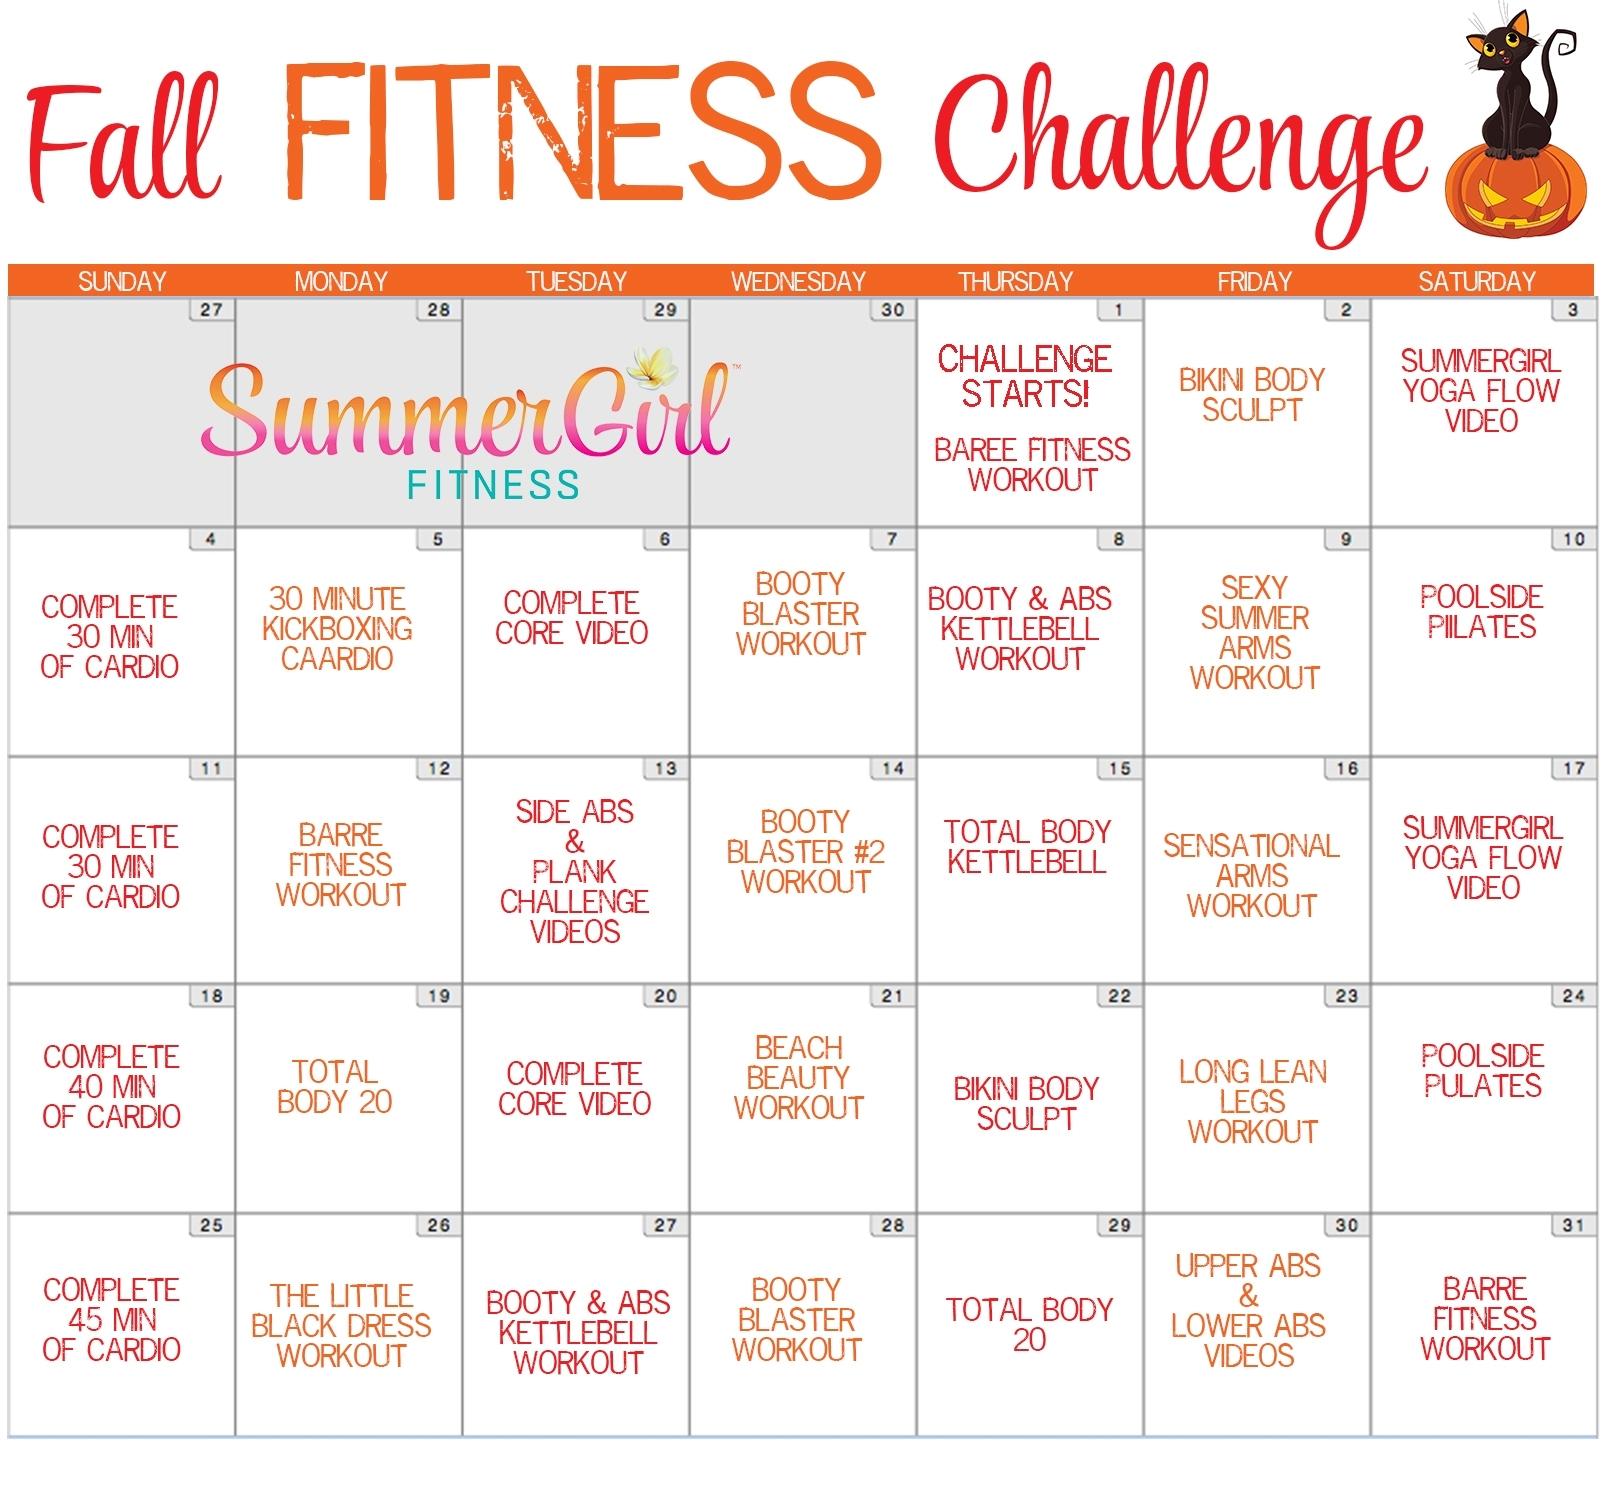 Fall Fitness Challenge Calendar | Summergirl Fitness